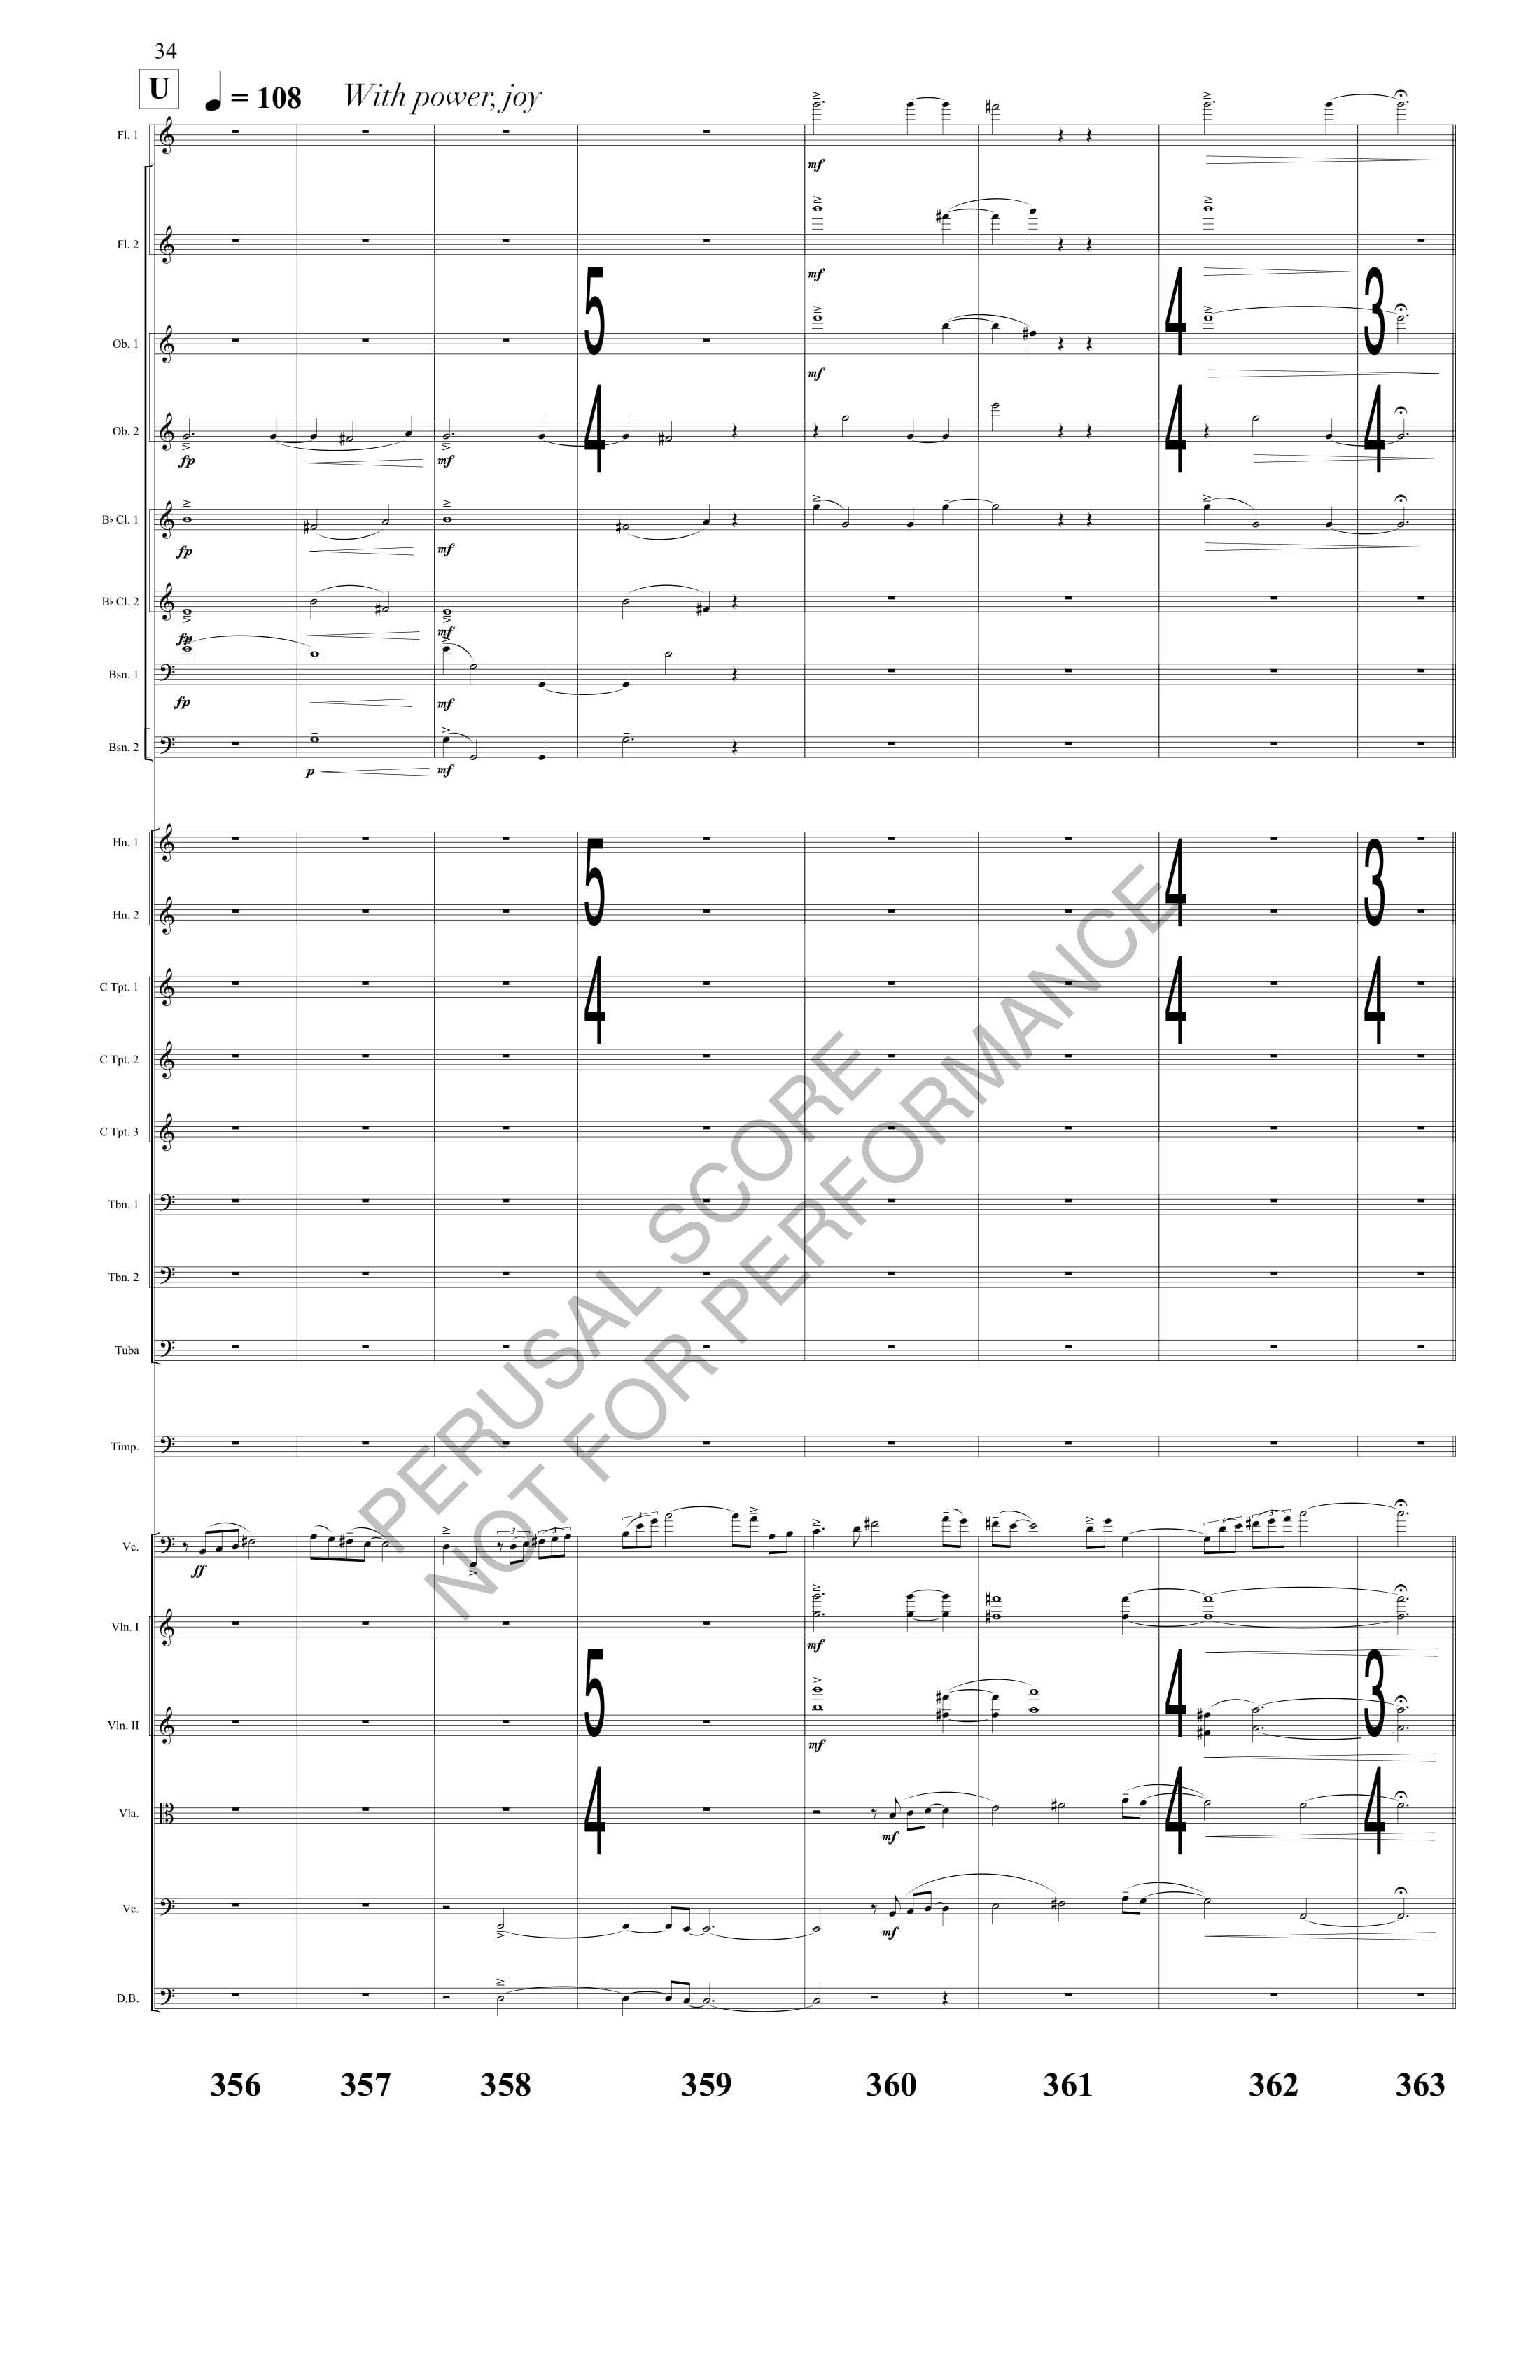 Boyd Tekton Score-watermark-40.jpg